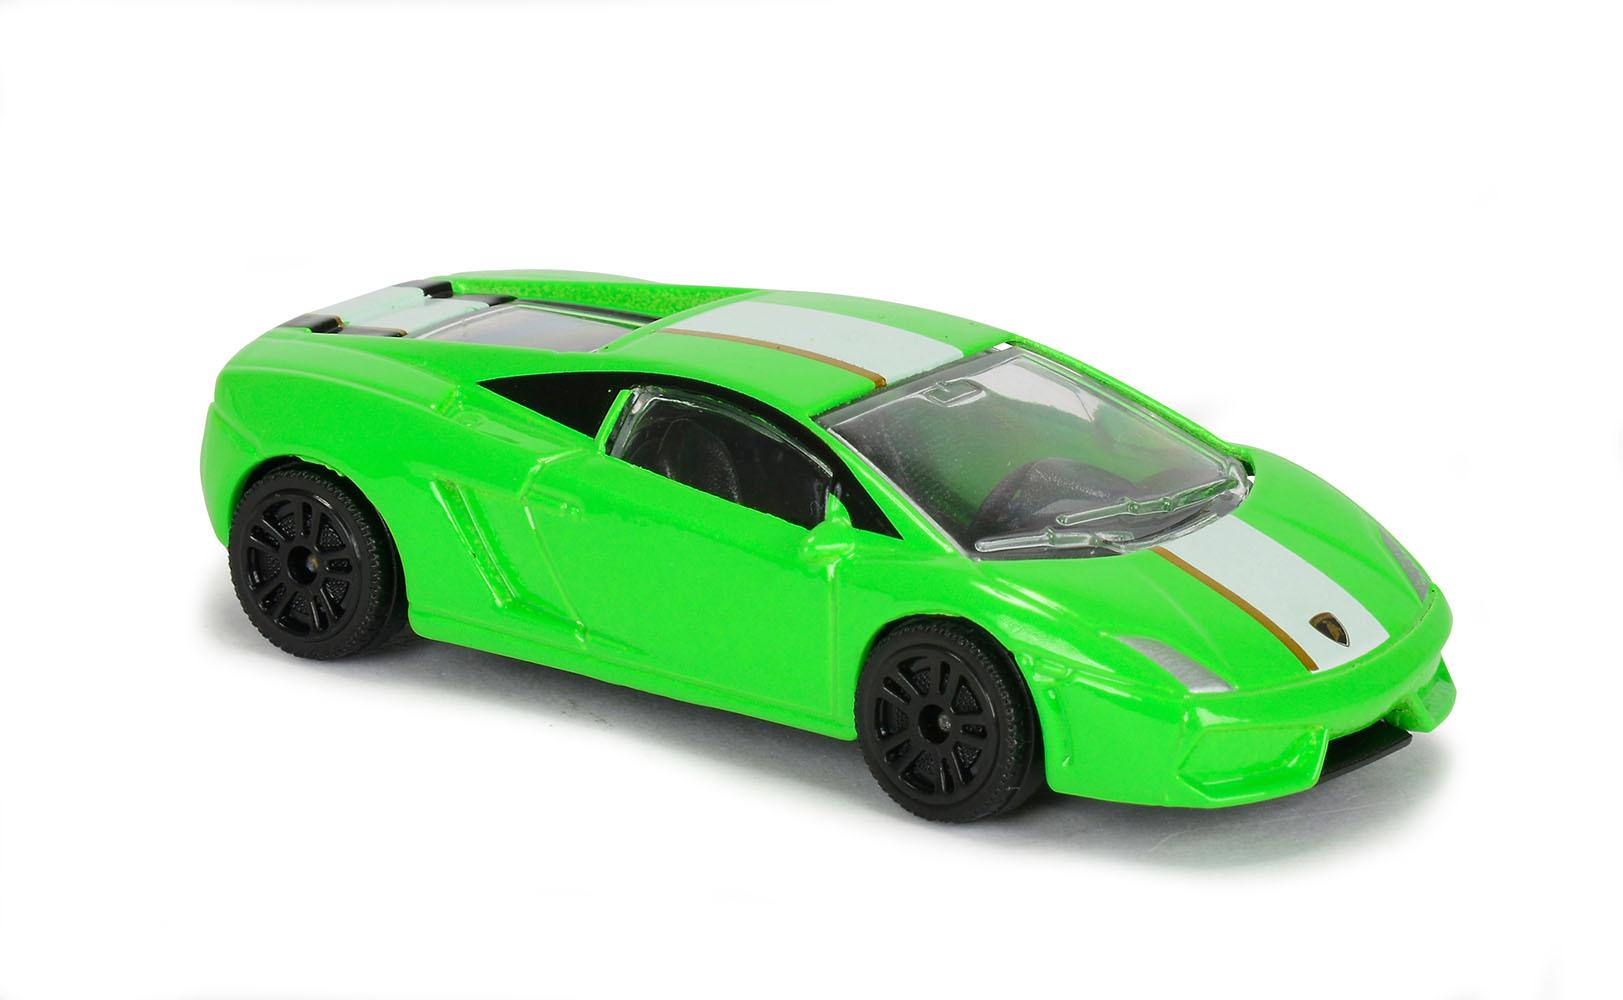 Majorette - Creatix Ensemble de course Lamborghini